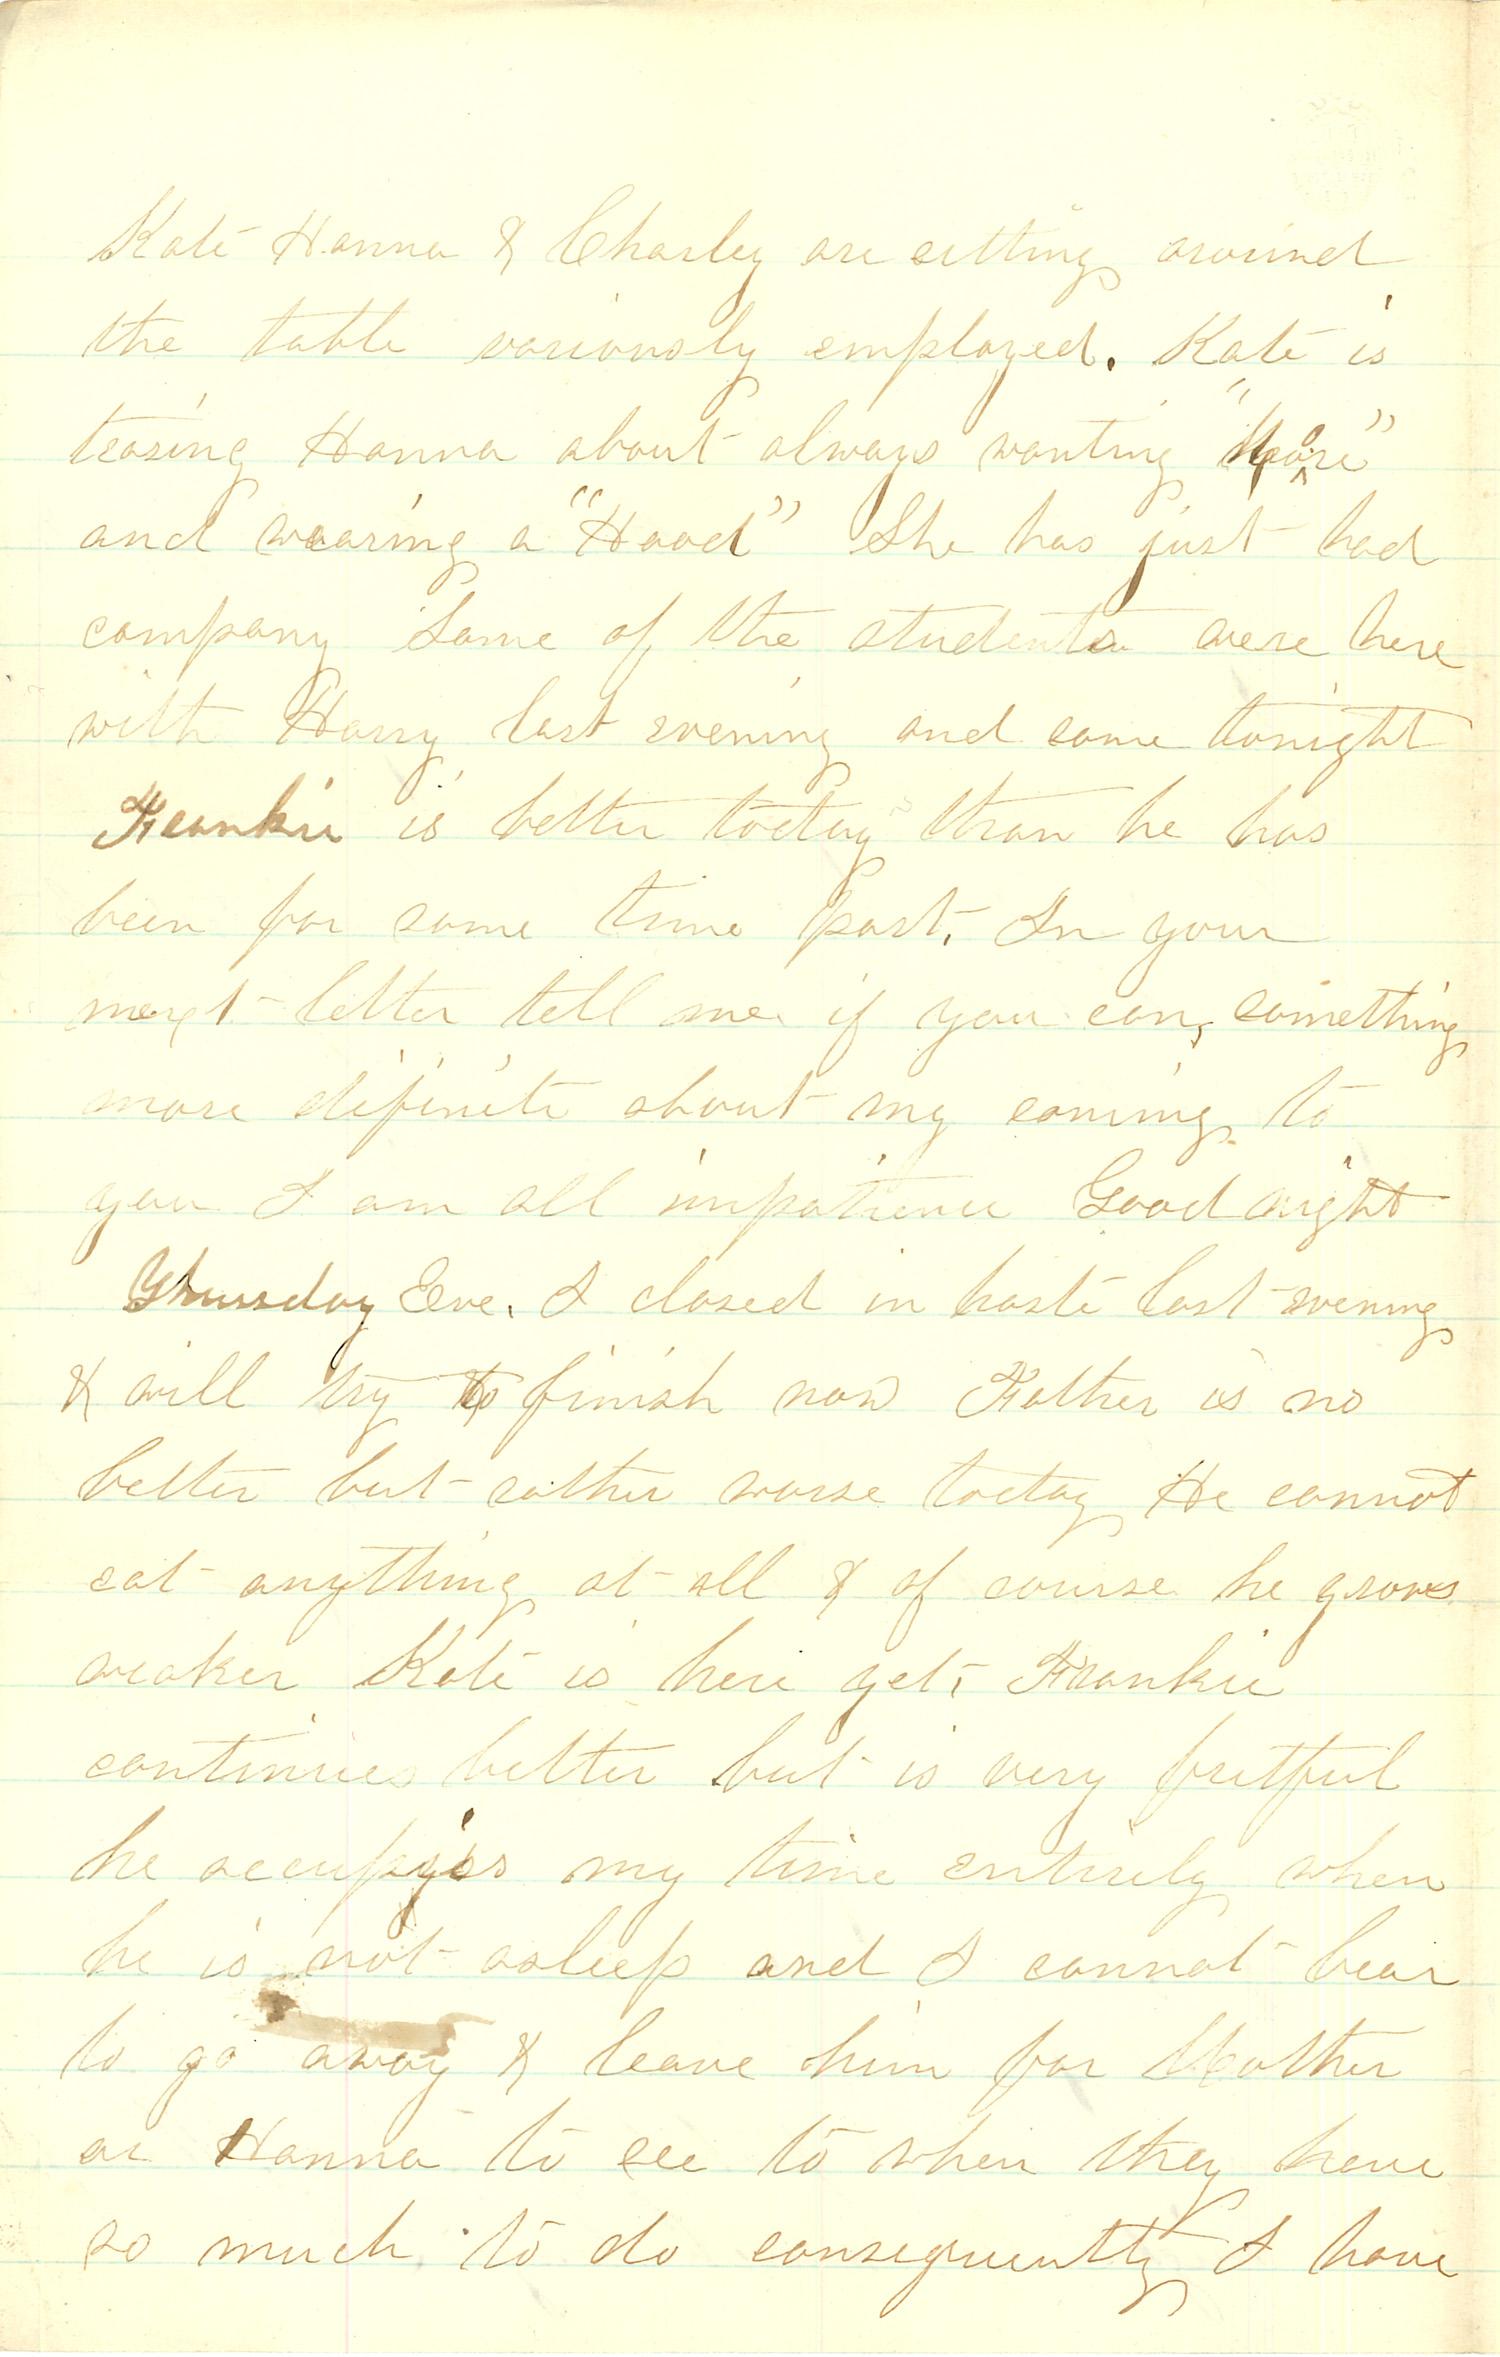 Joseph Culver Letter, September 27, 1863, Page 2